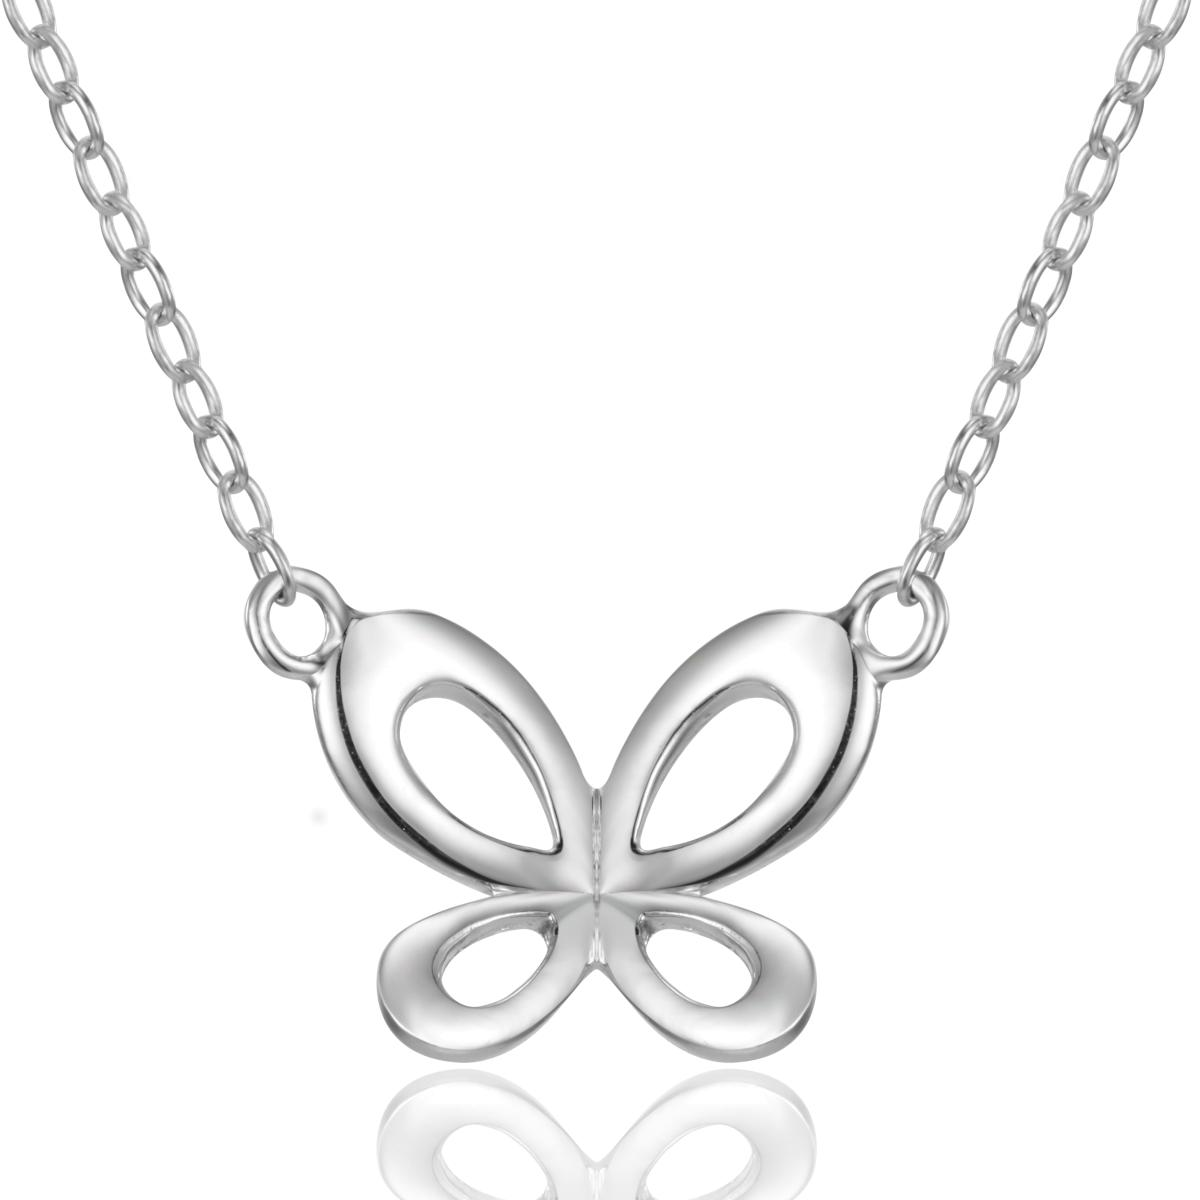 Pendent clipart jewelry Inc 2NE1 Fashion Fashion jewellery